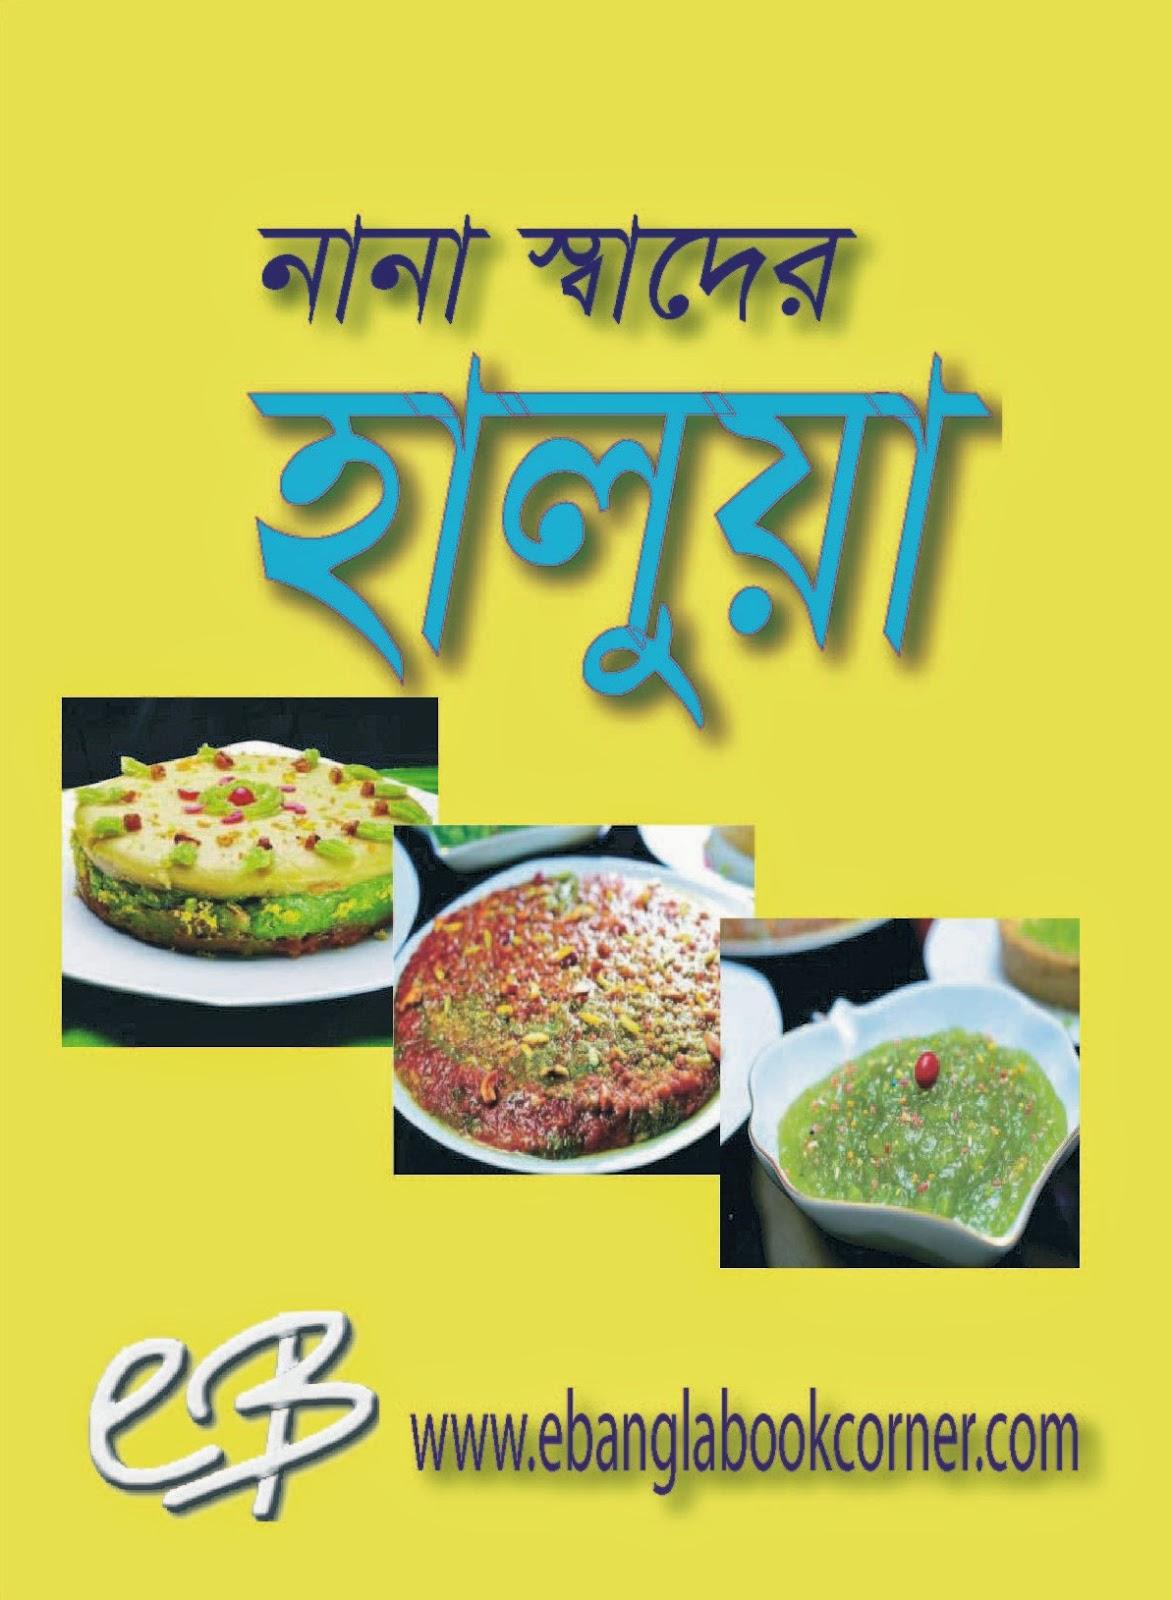 Bangla e books free downloaddownload pdf ebooks all types august bengali recipe book nana swader haluya pdf download forumfinder Images